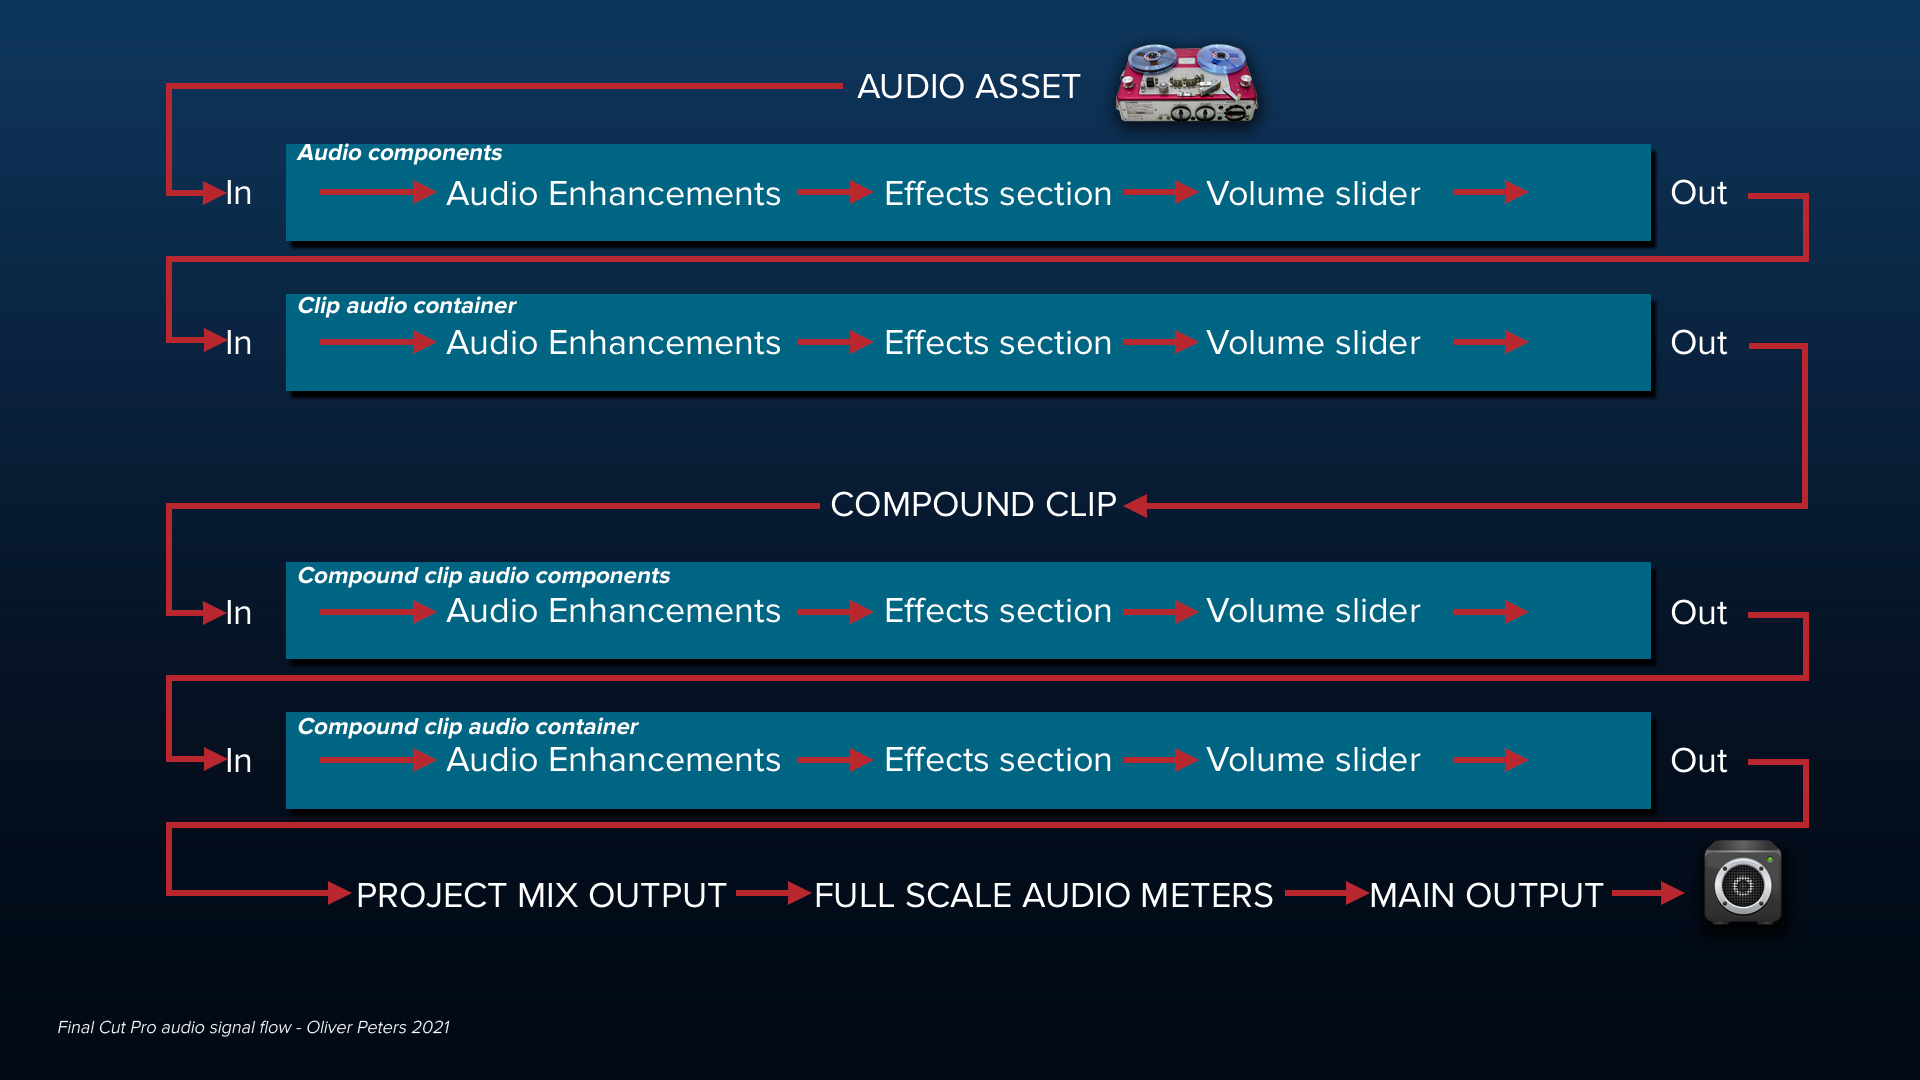 final cut pro mix audio 2